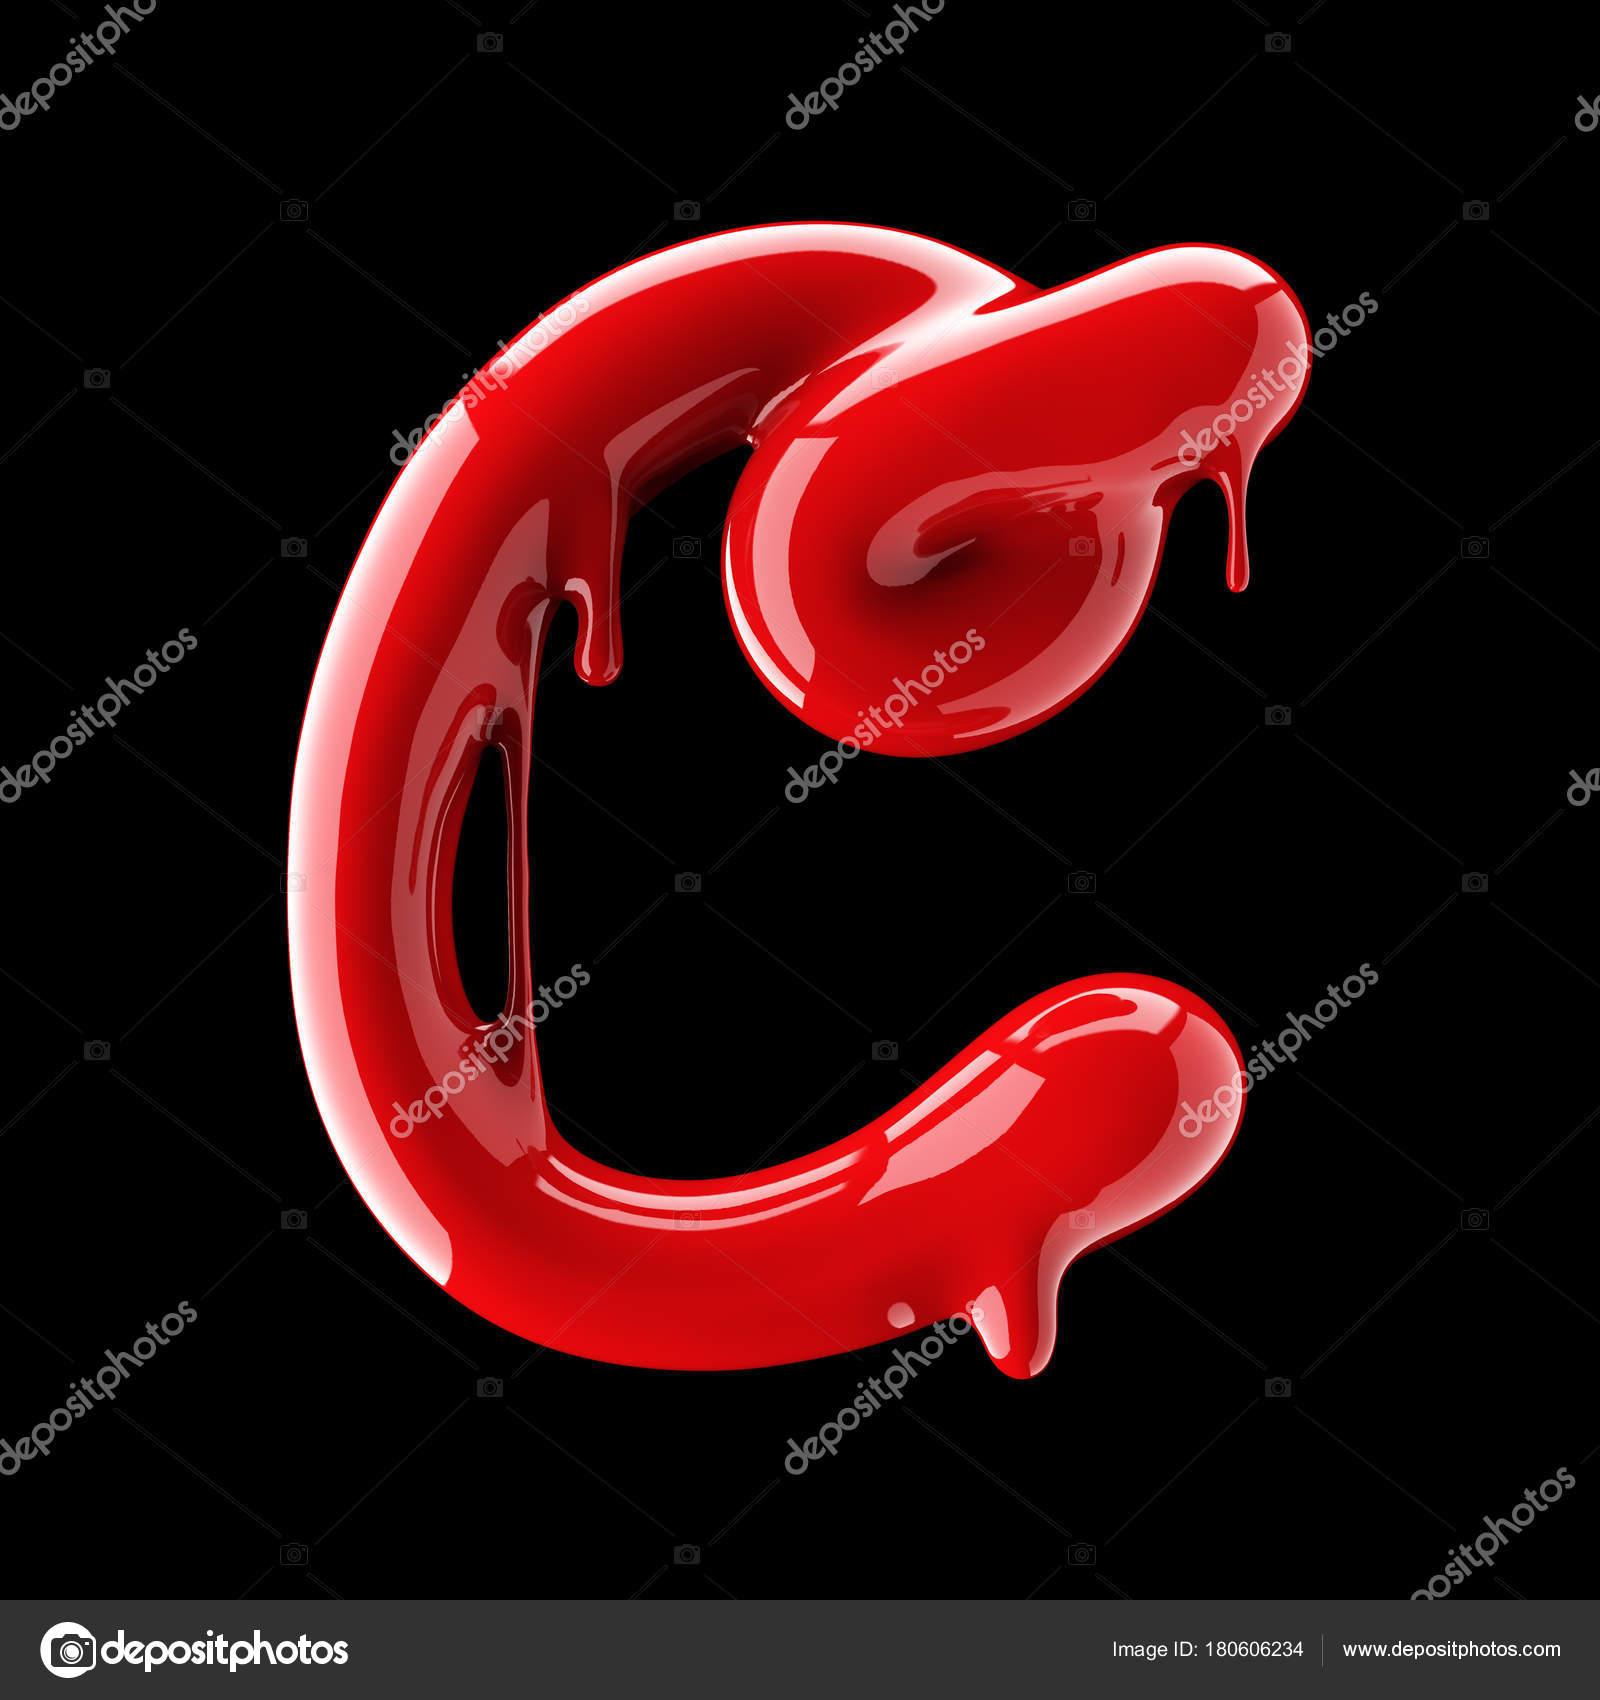 Leaky red alphabet on black background handwritten cursive letter c leaky red alphabet on black background handwritten cursive letter c stock photo buycottarizona Gallery